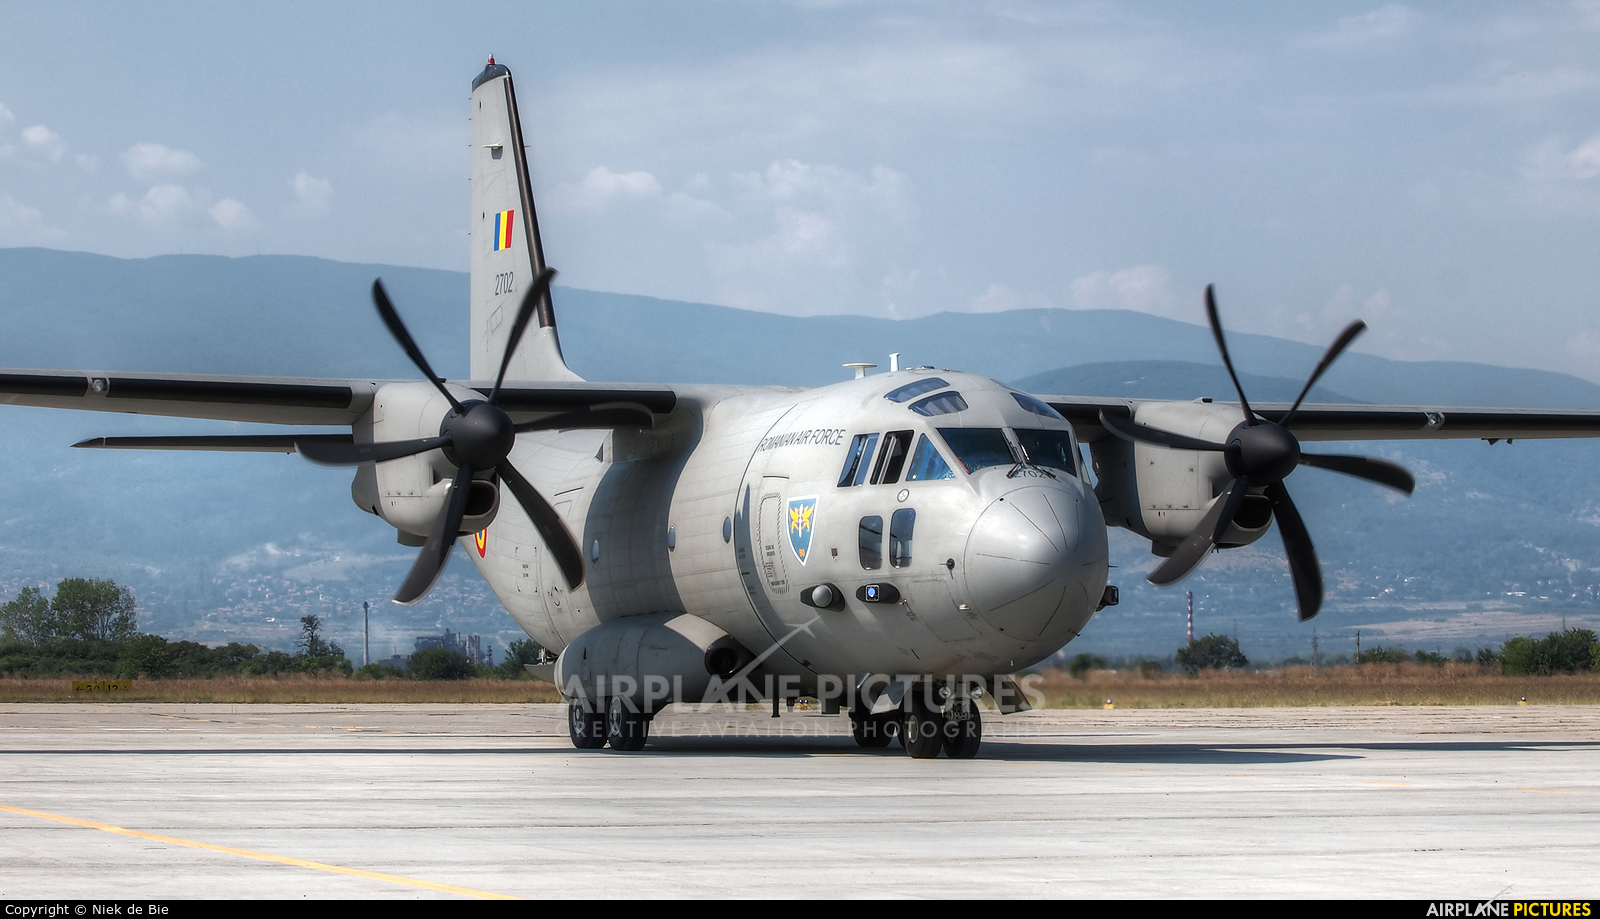 Romania - Air Force 2702 aircraft at Plovdiv - Krumovo